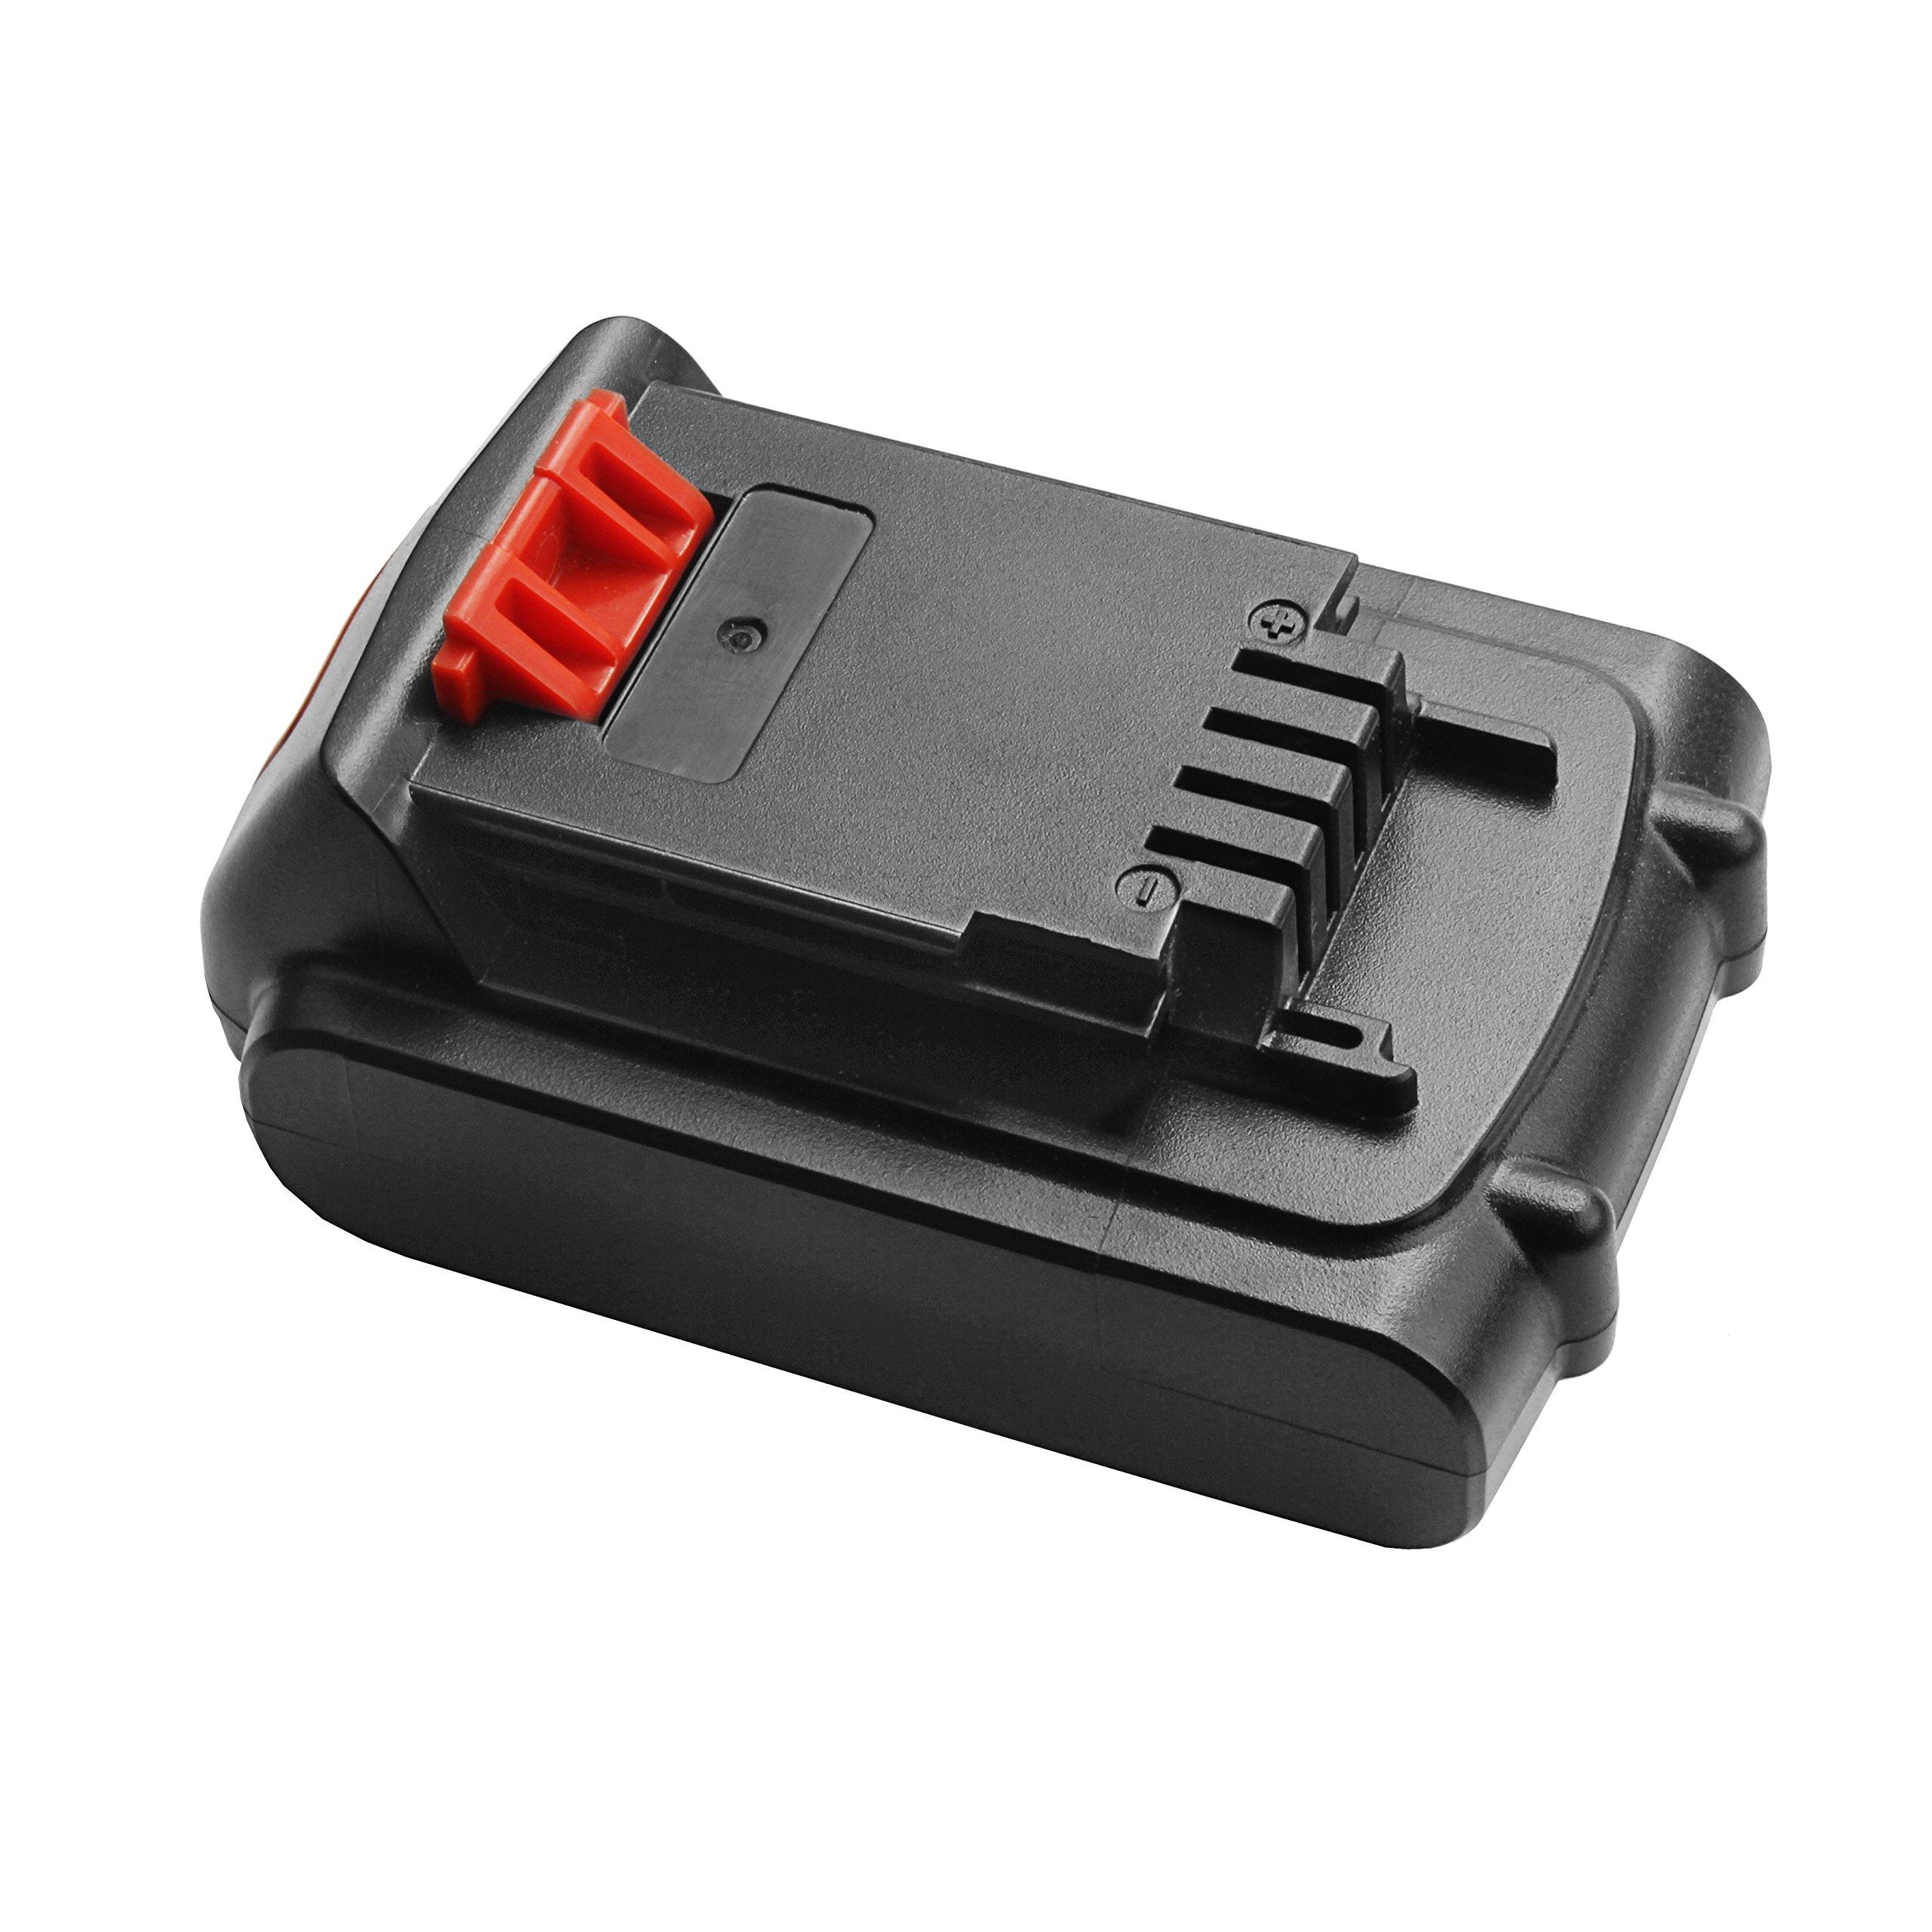 Turpow 20V 2.0Ah Lithium Ion Replacement Battery for Black & Decker 20 Volt MAX LBXR20 LB20 LBX20 LBXR2020-OPE LBXR20B-2 LB2X4020 Cordless Tool Battery